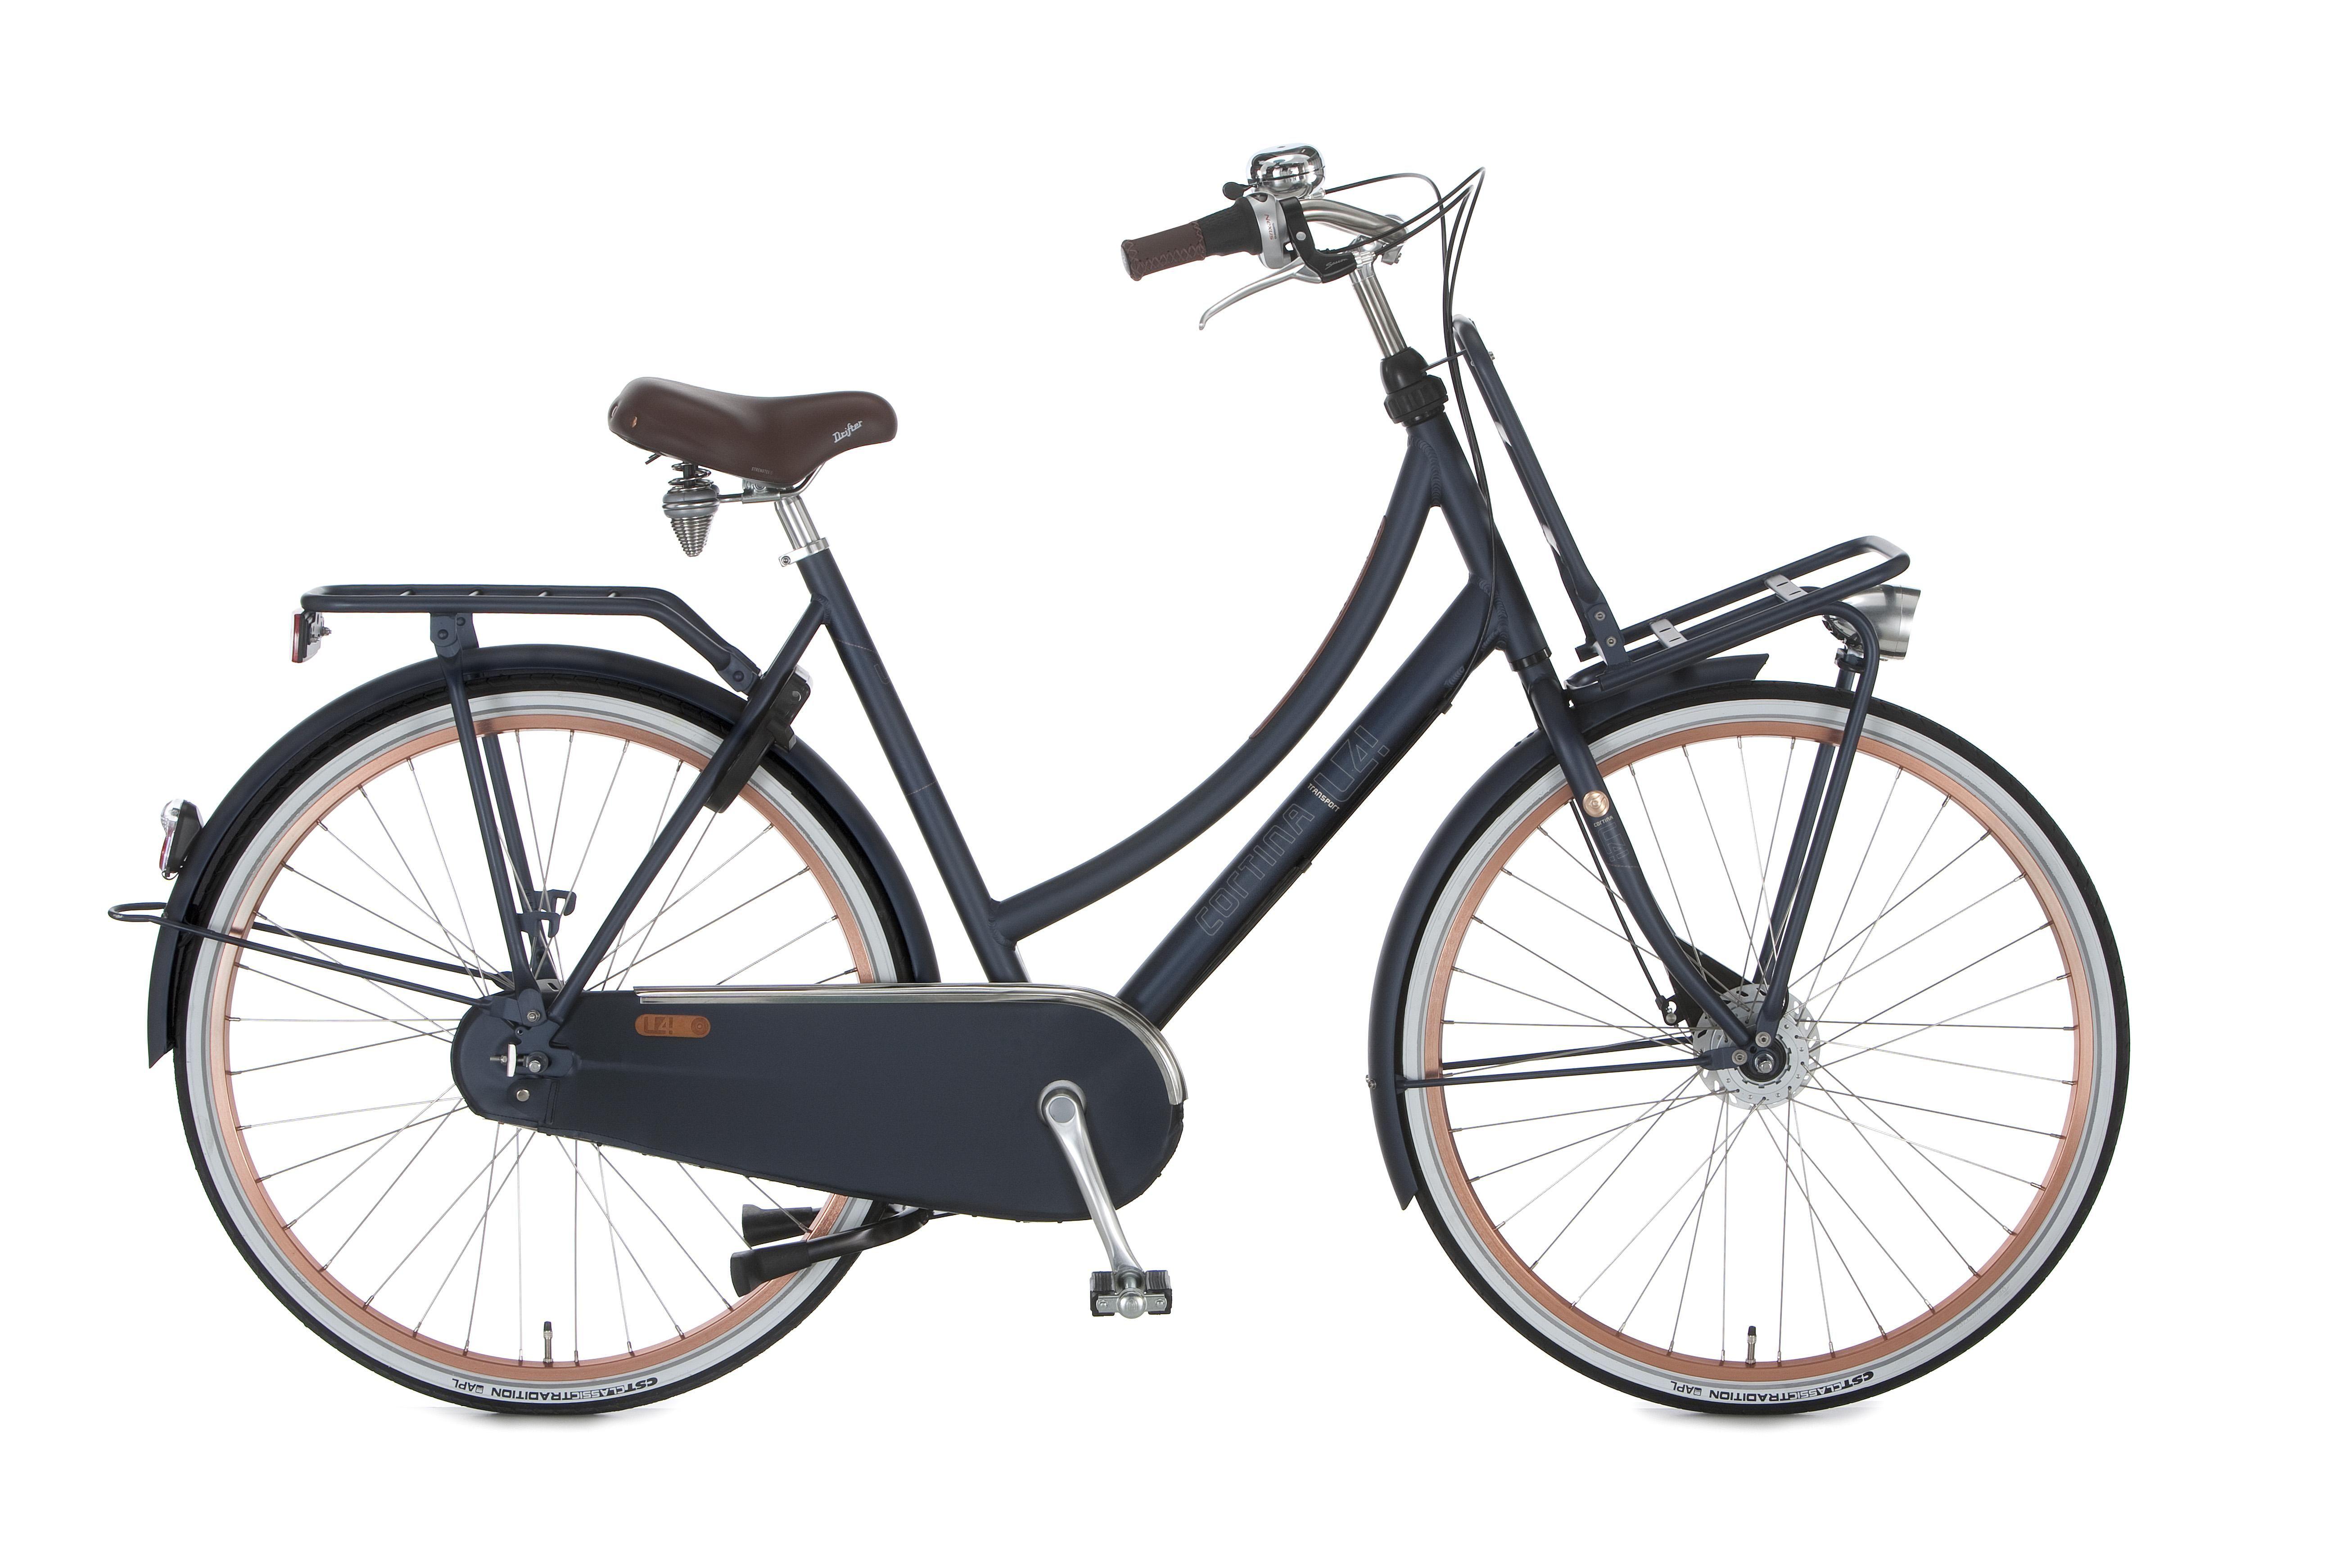 Cortina U4 Transport Denim N7 2016 Dame Cykel Cykler